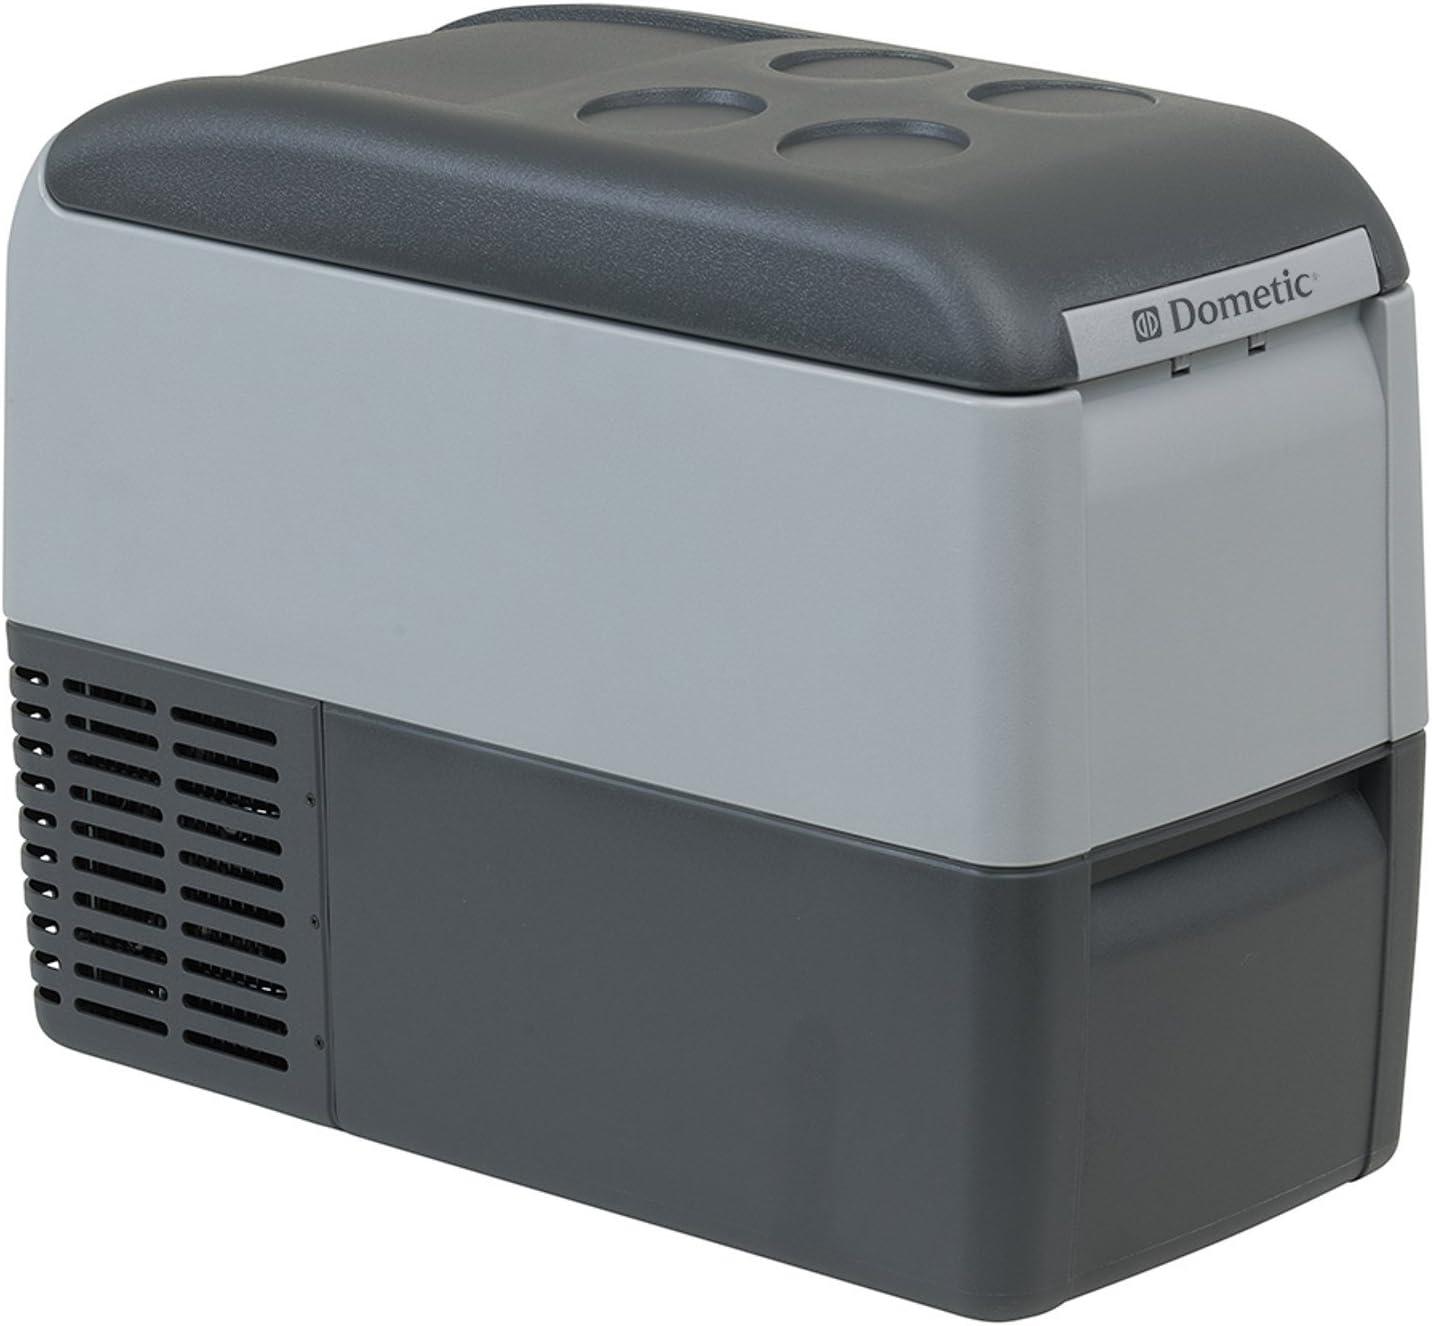 Dometic CF-025DC Portable Freezer/Refrigerator